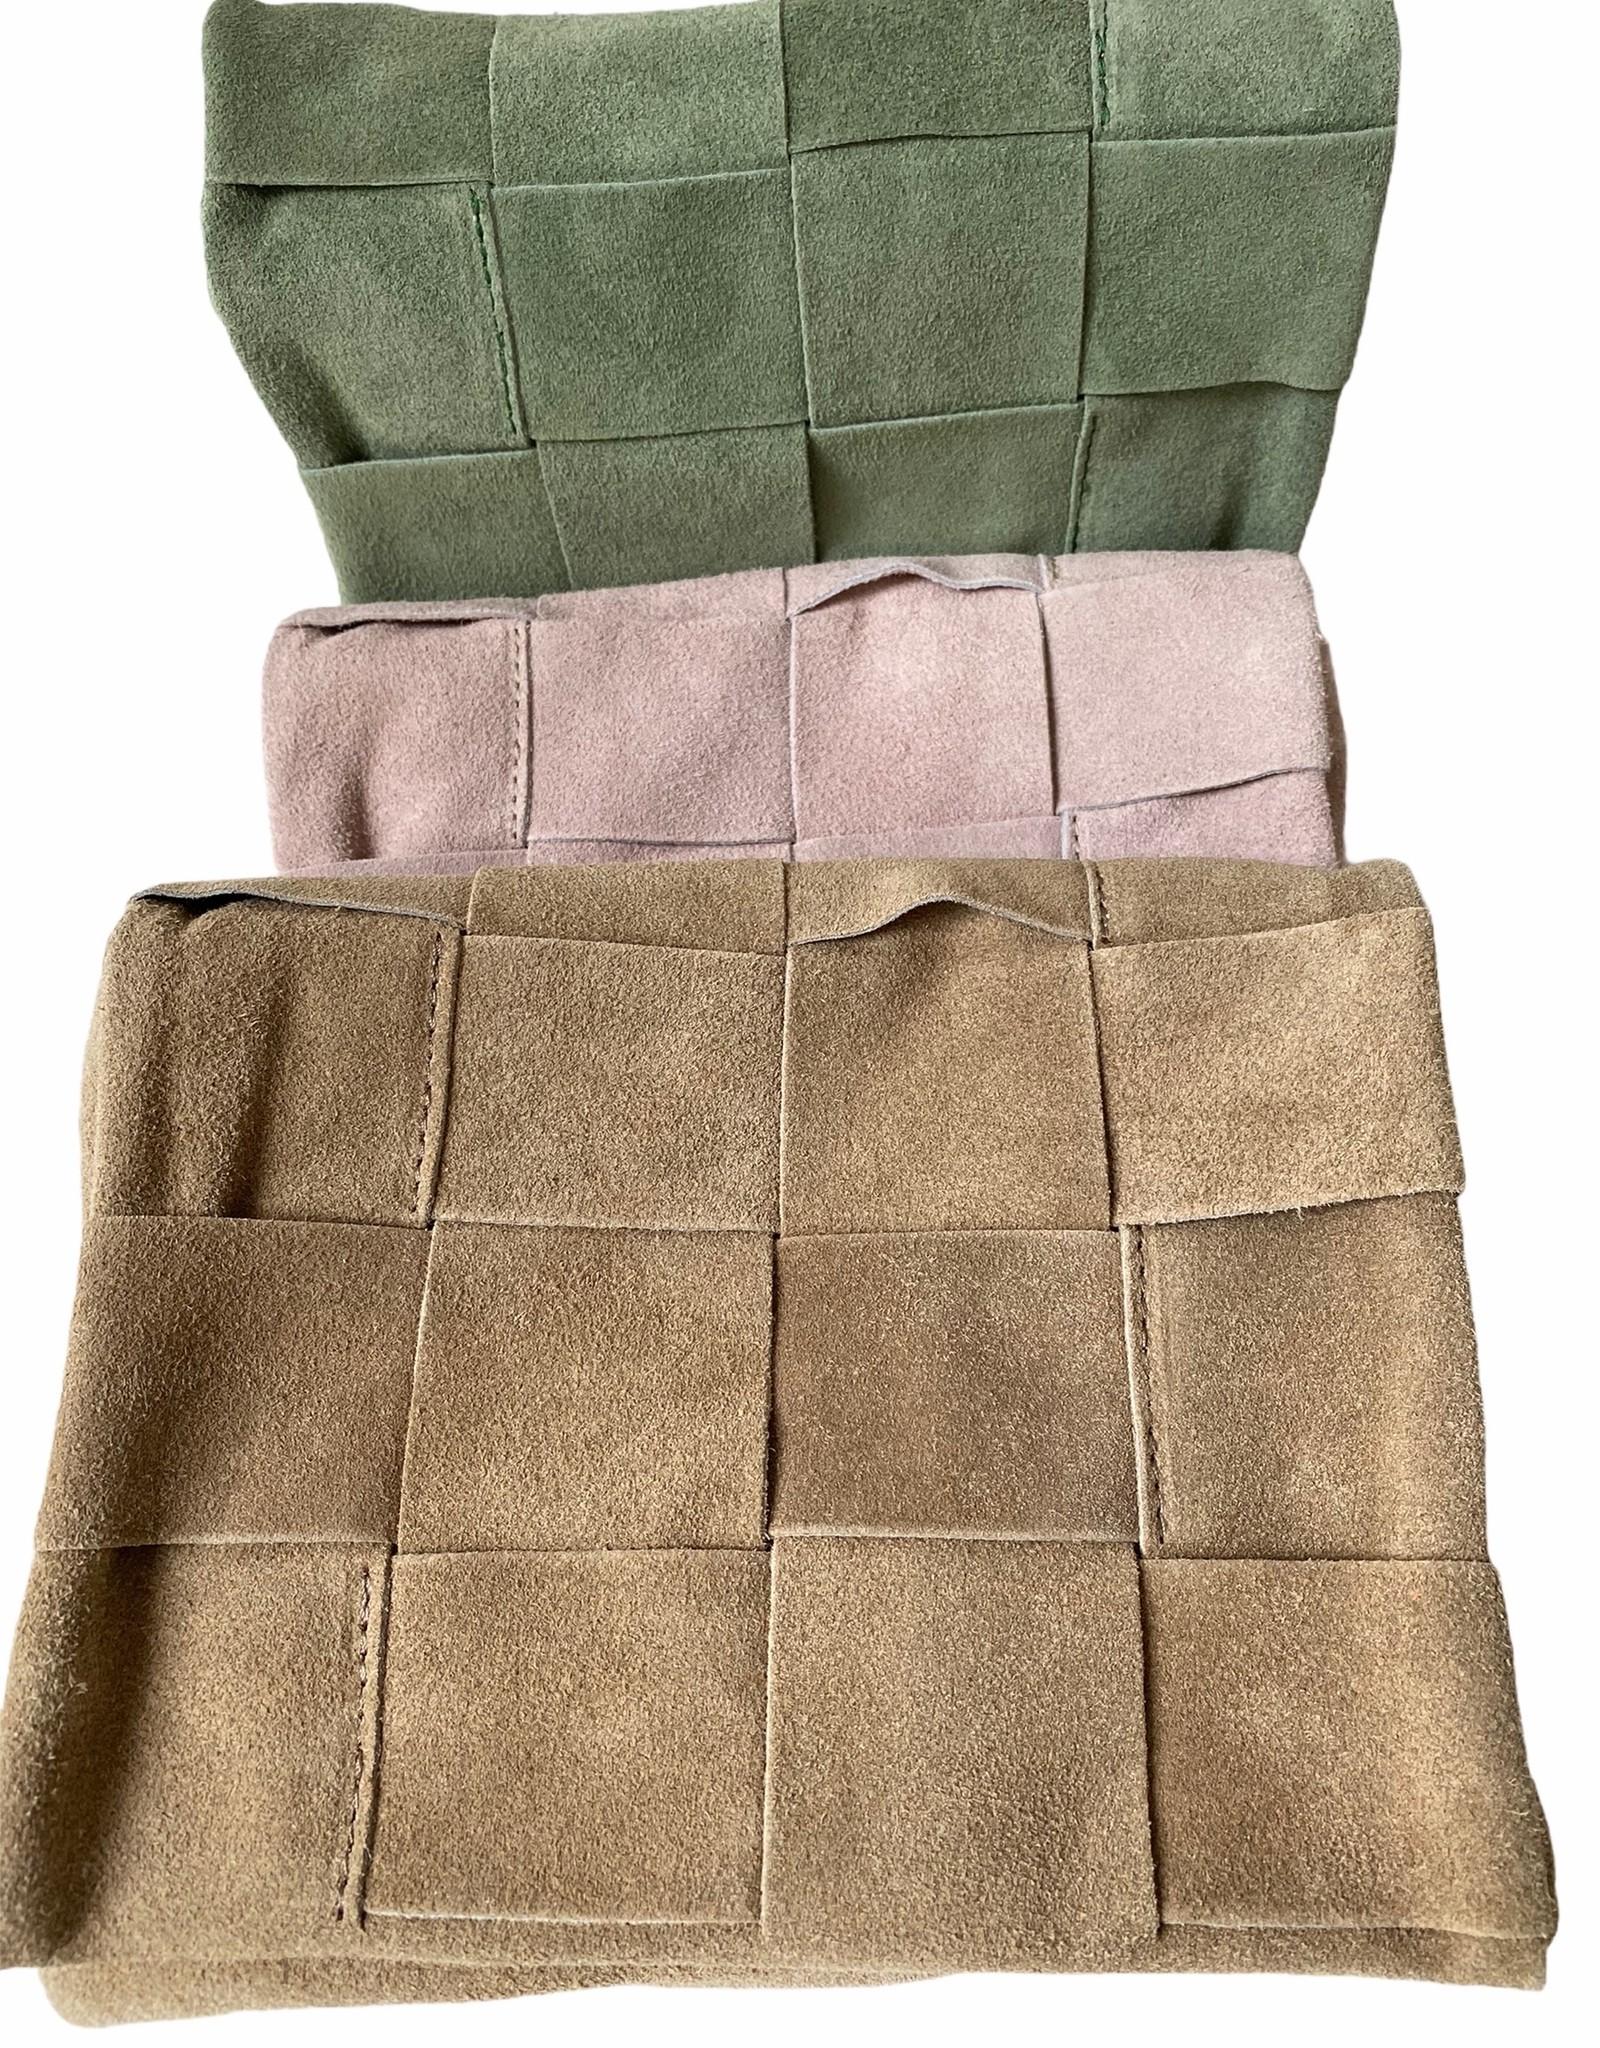 Tasje in daim, valt soepel breed gevlochten met twee vakken die met rits sluiten.